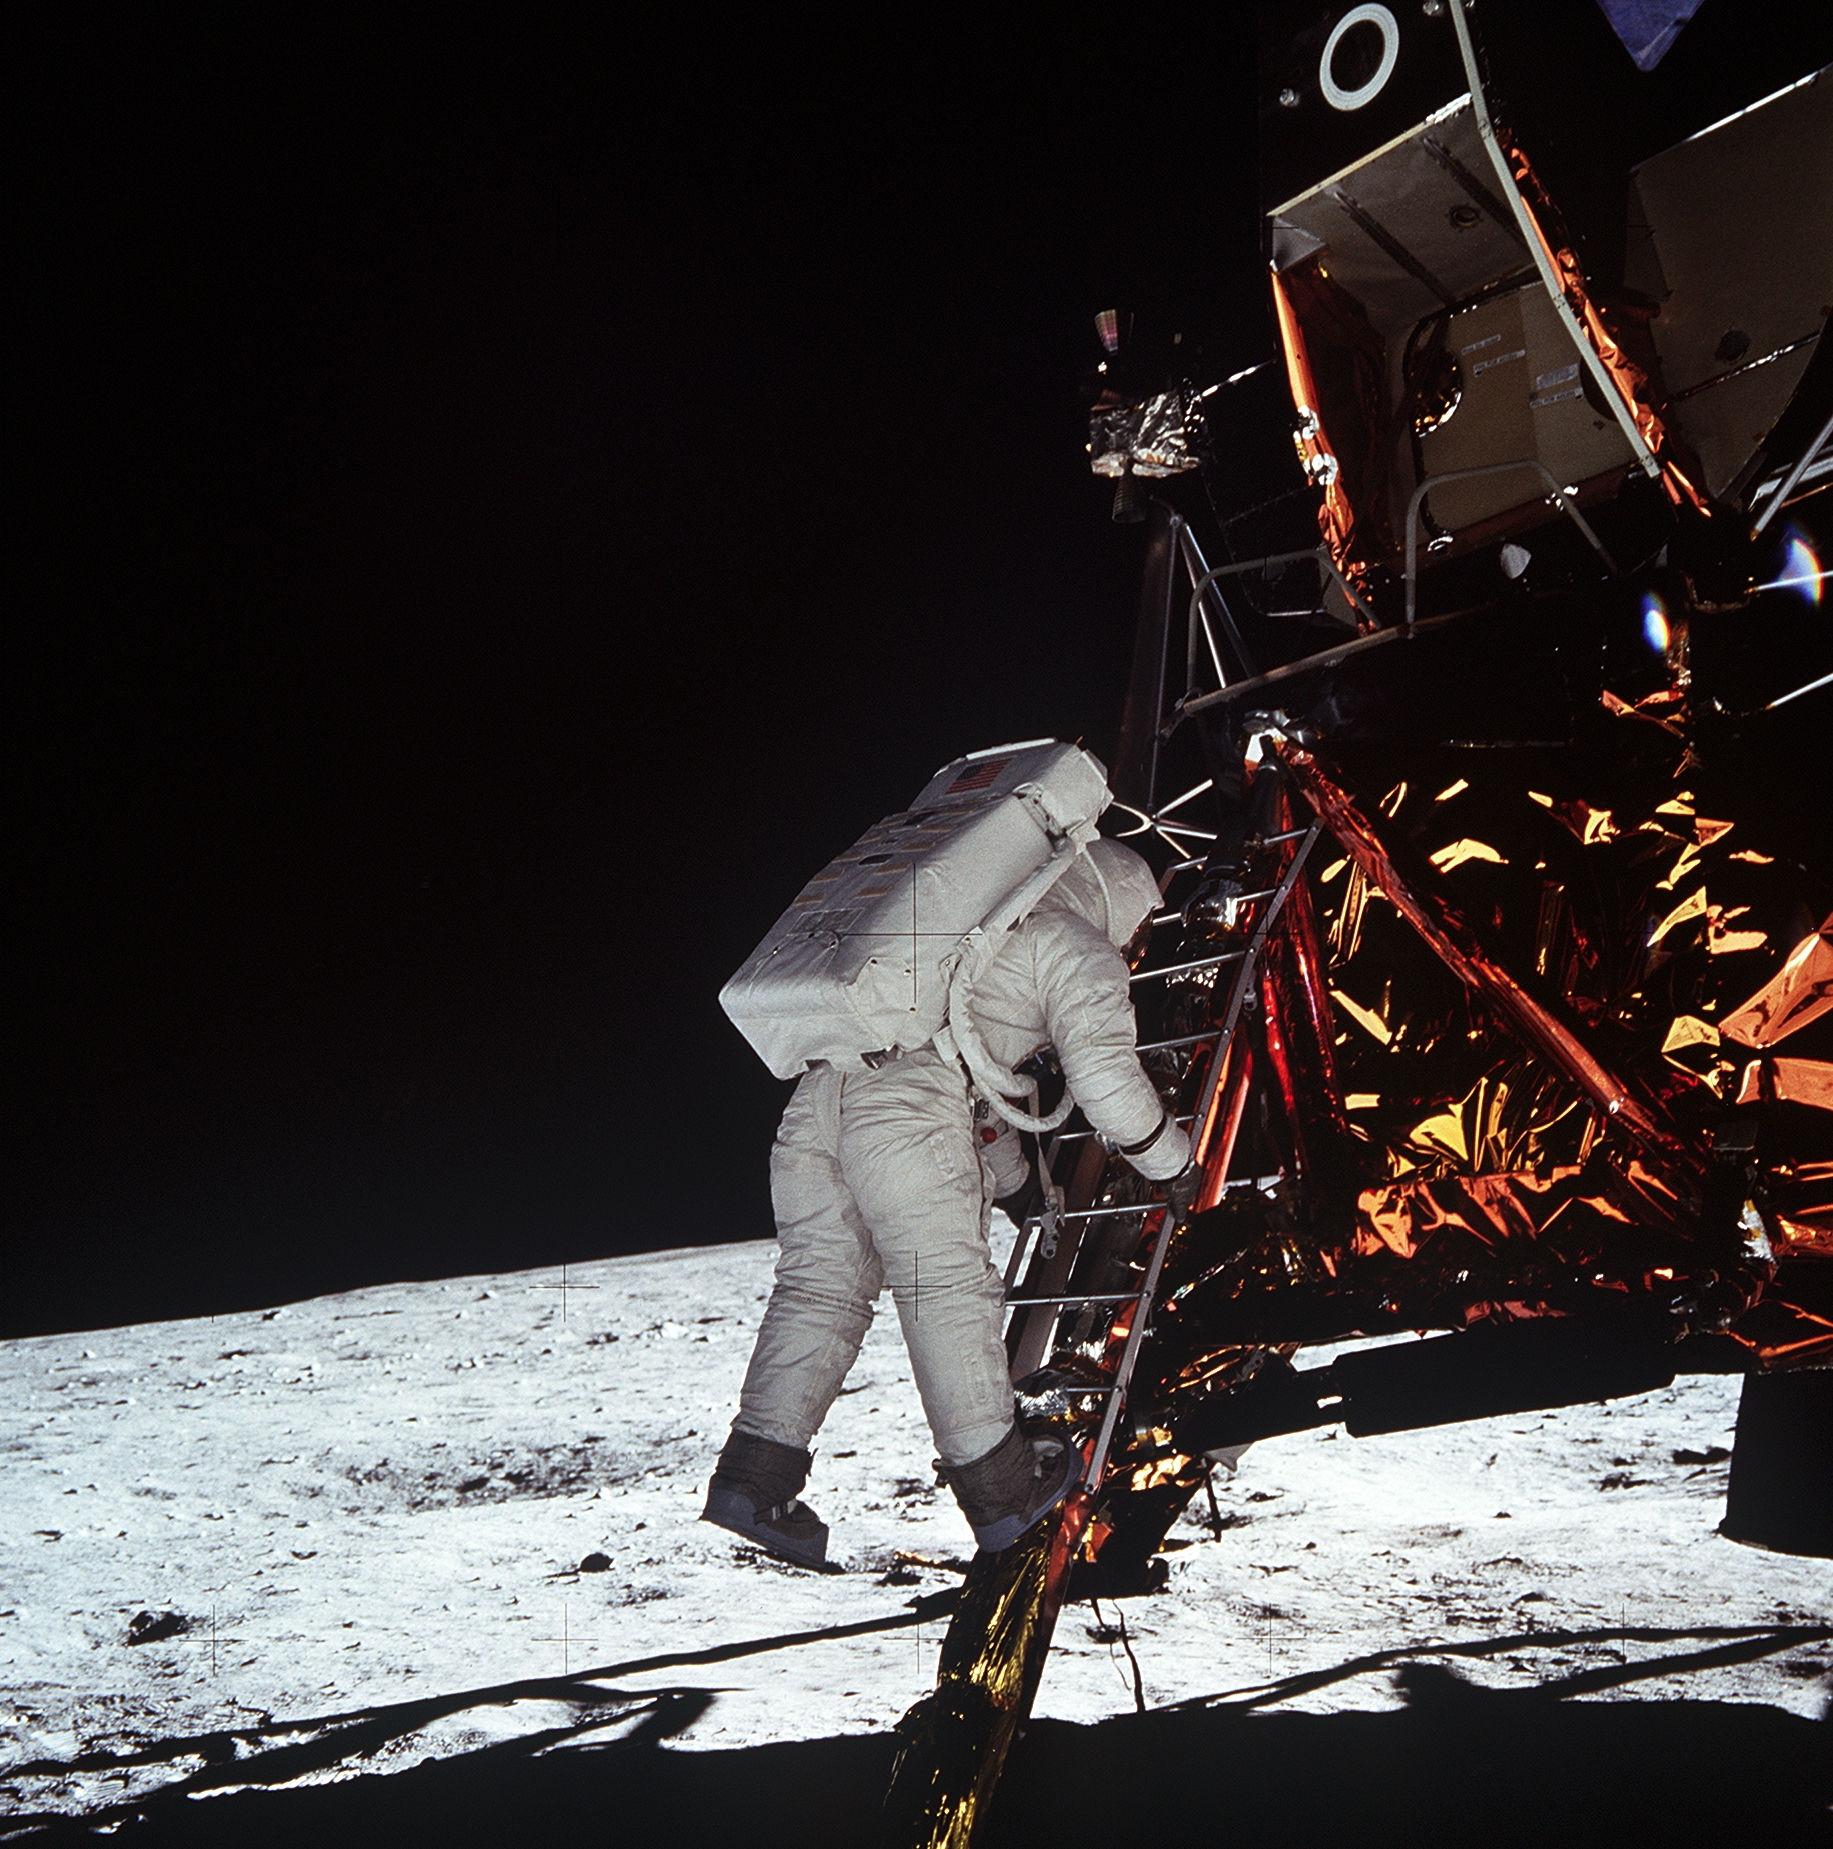 apollo 11 space walk - photo #16